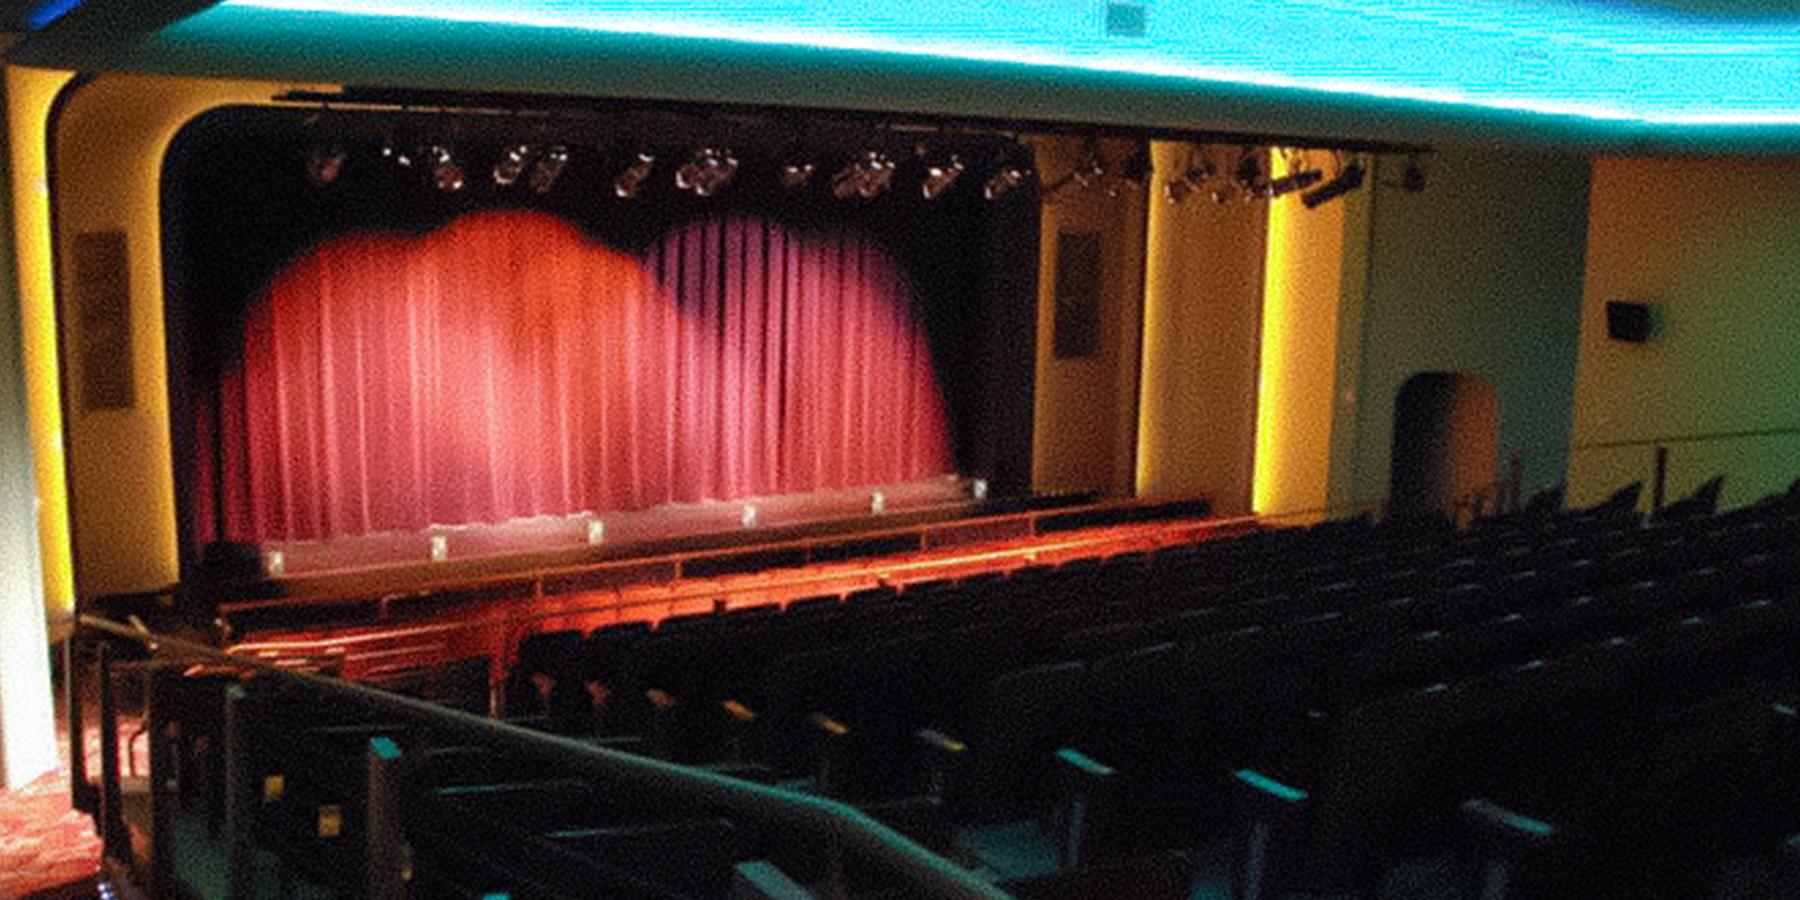 Uptown Theater Grand Prairie, Texas. Instal by Infinity Sound of Grand Prairie, Texas.